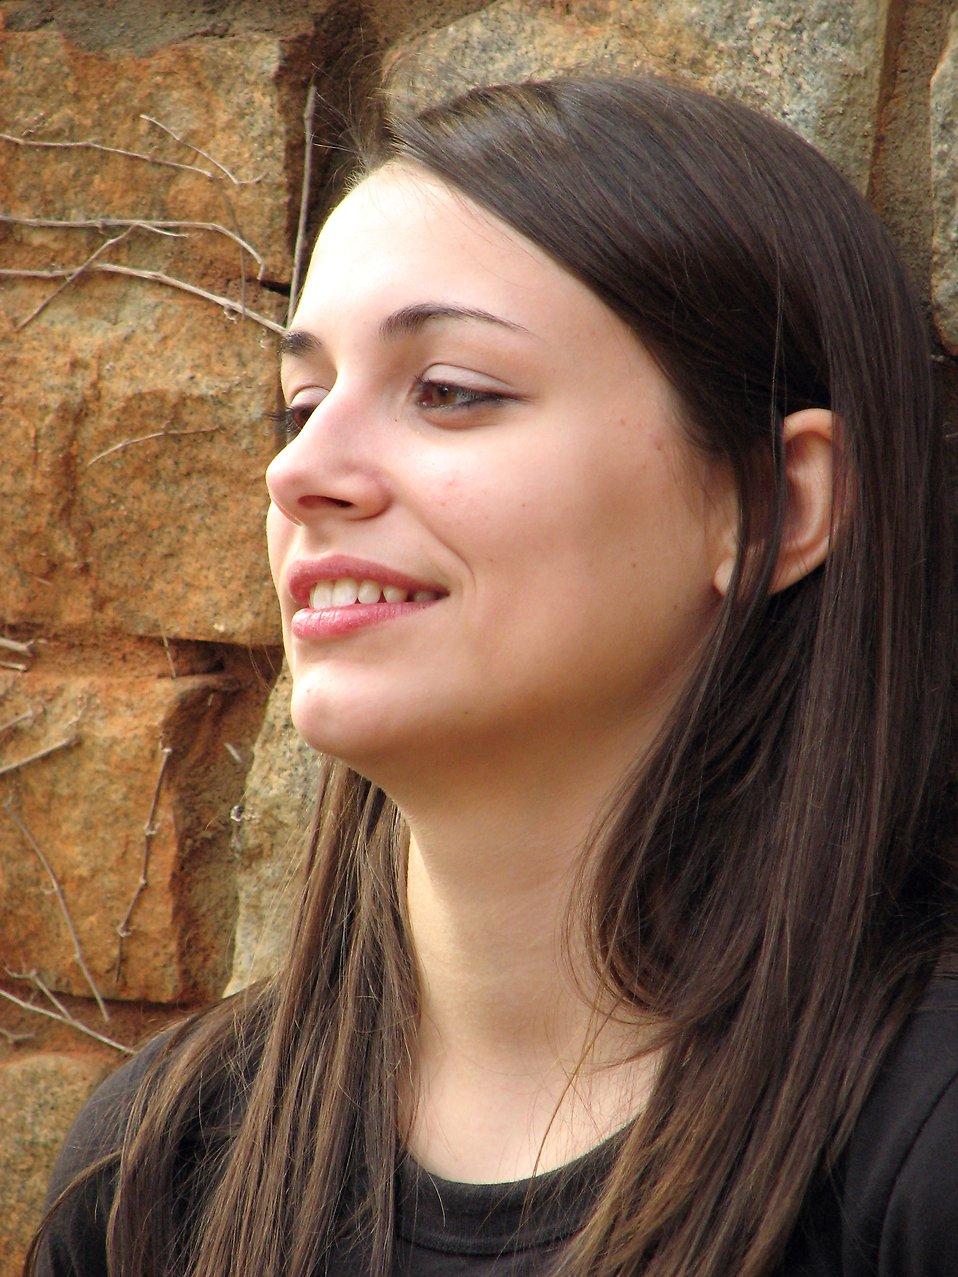 Closeup outdoor portrait of a teen girl : Free Stock Photo